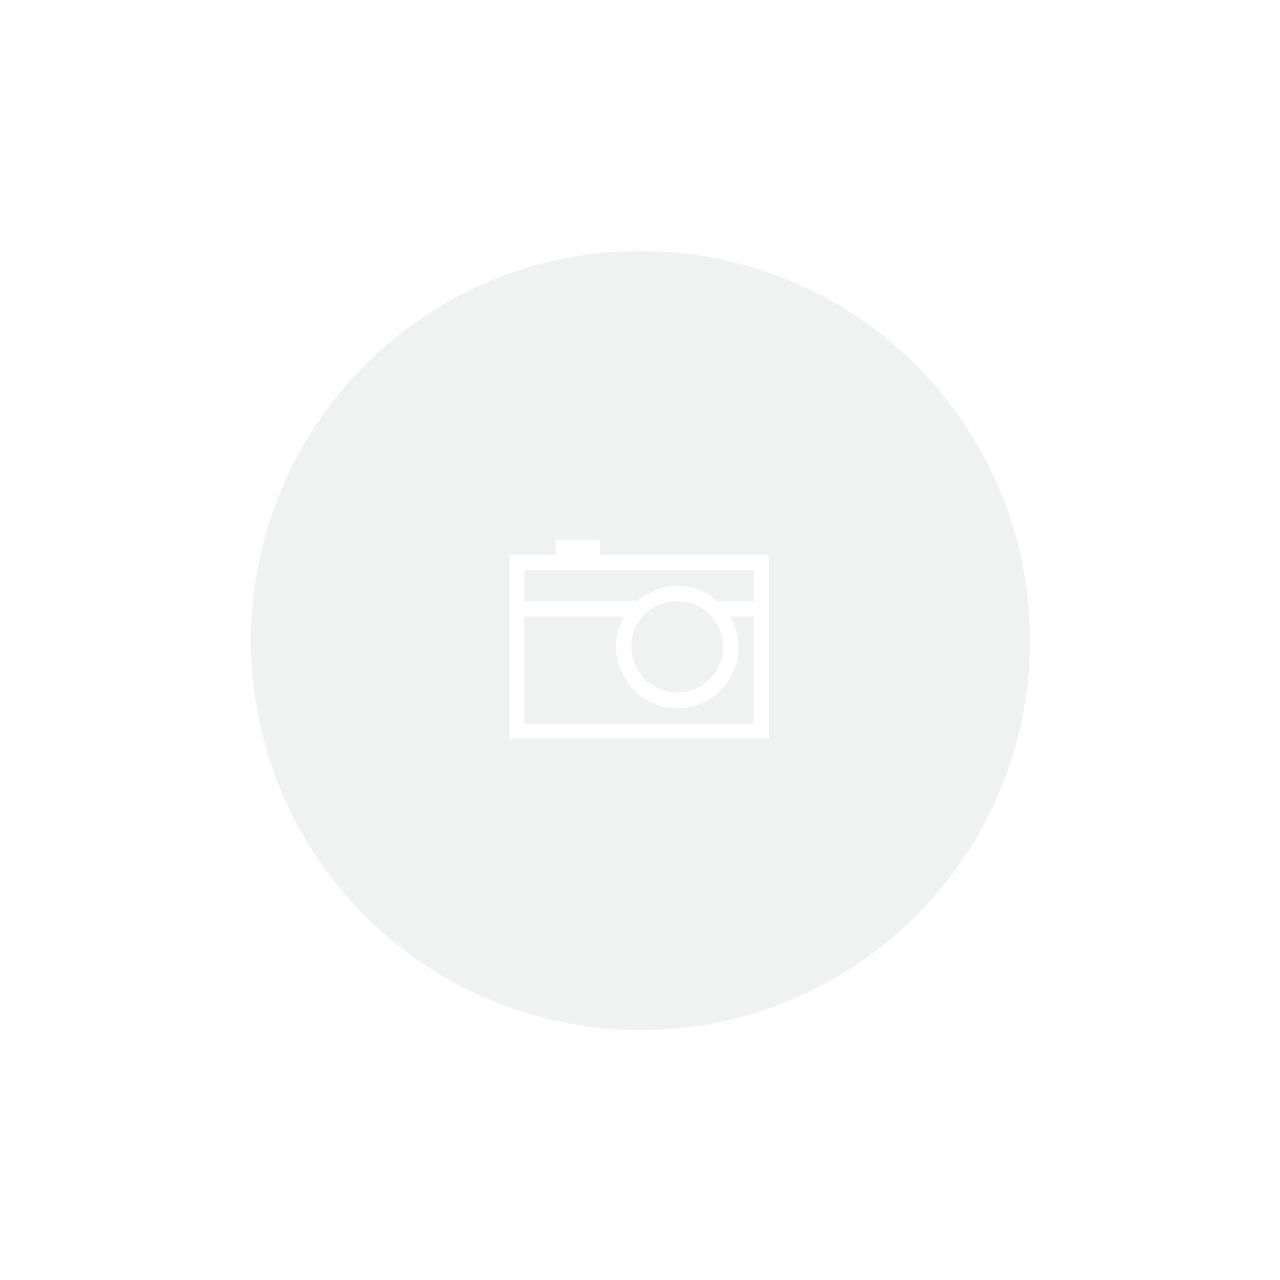 COROA 34D ICTUS NARROW WIDE BCD 104mm 4 FUROS (12V)